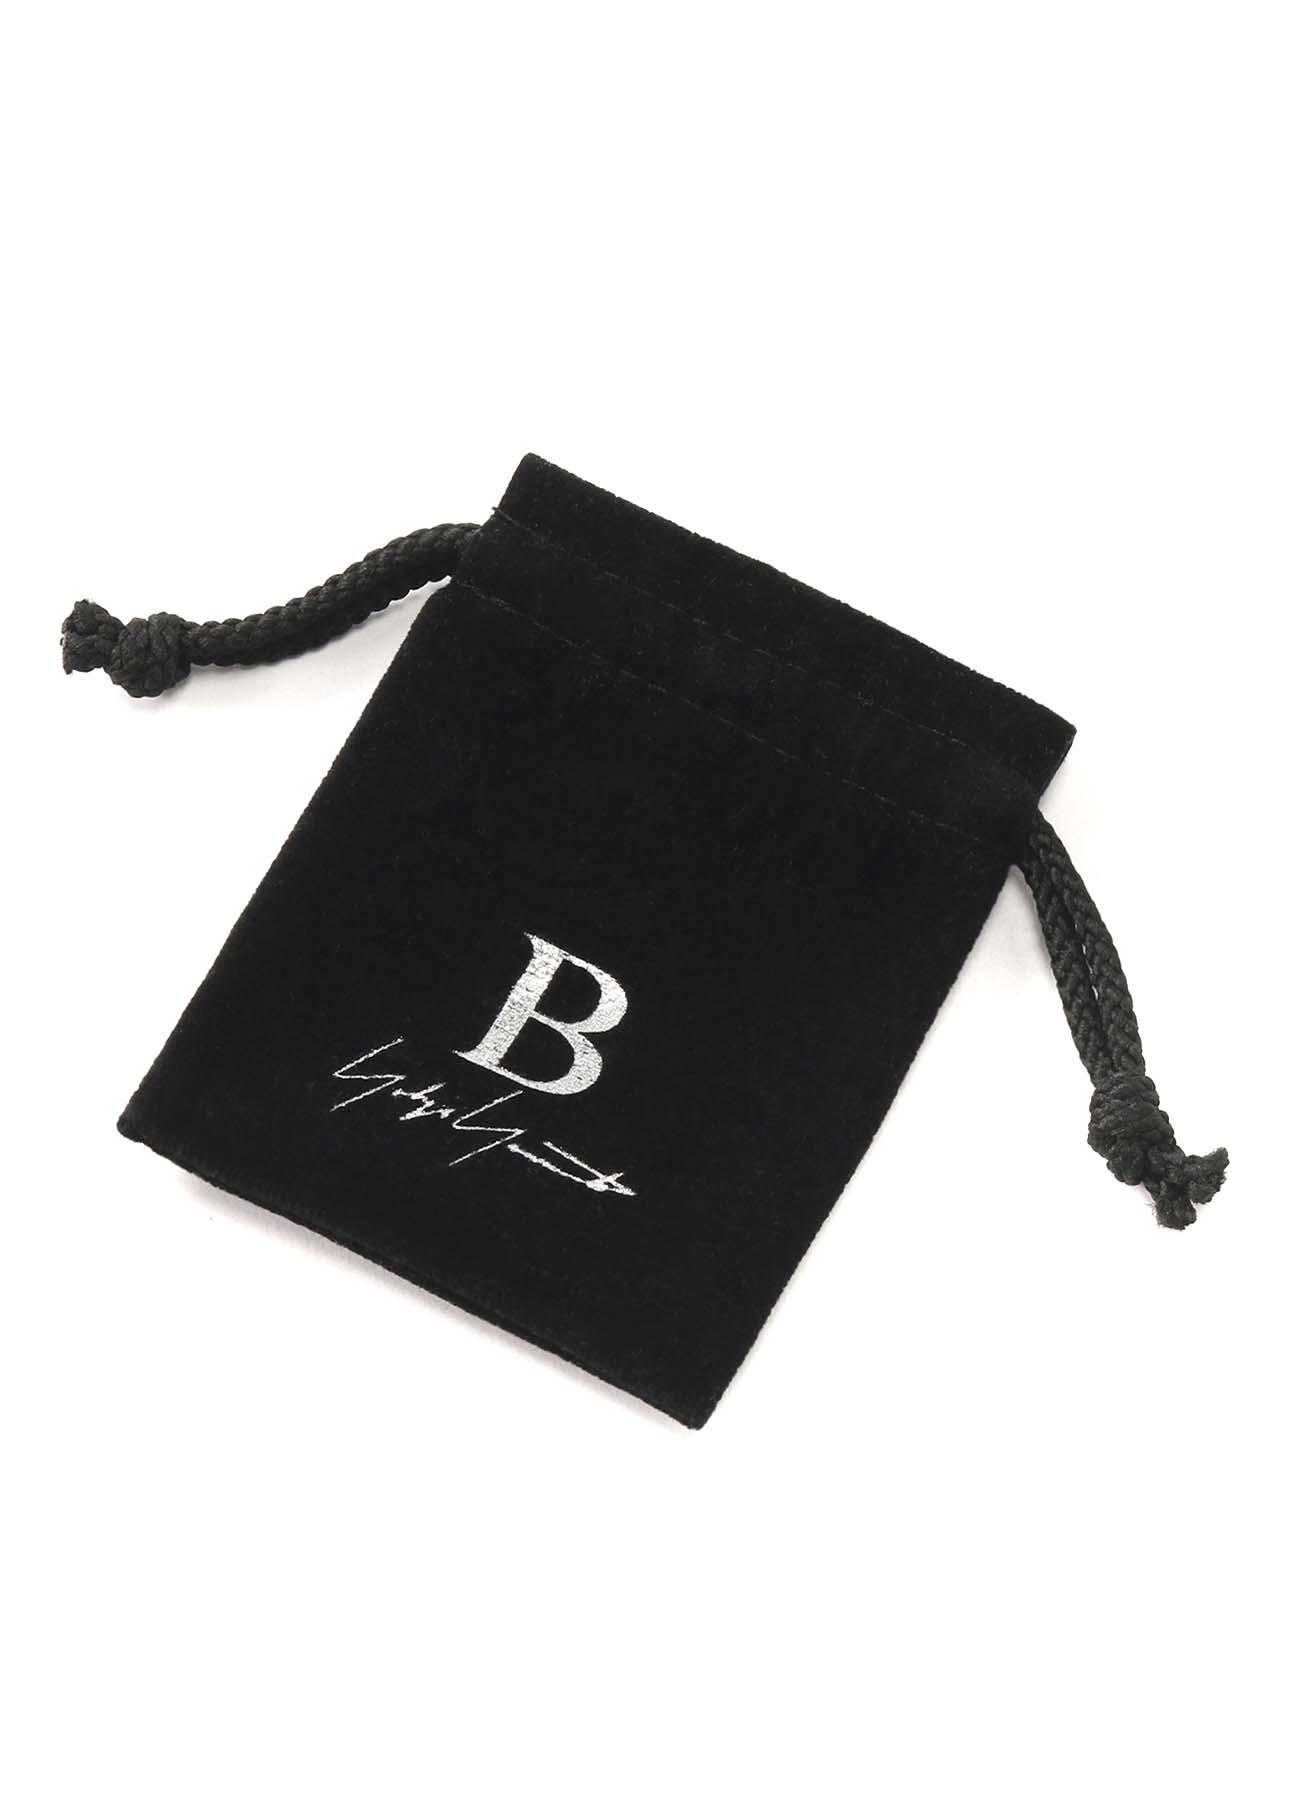 B Yohji Yamamoto vehicle Pin badge